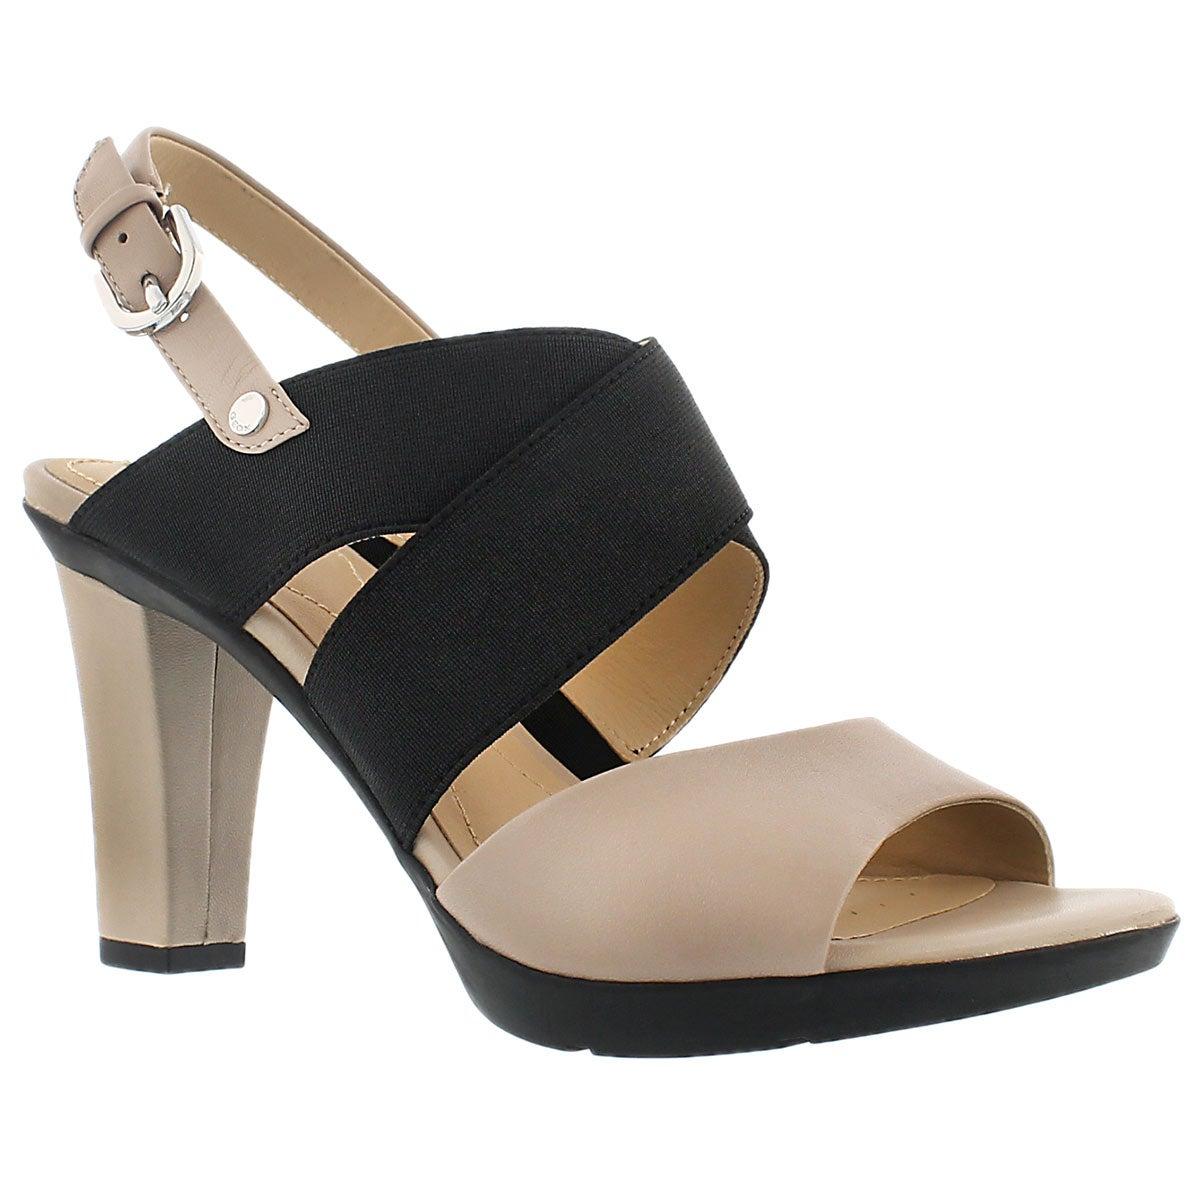 Lds Jadalis lt taupe/blk dress sandal